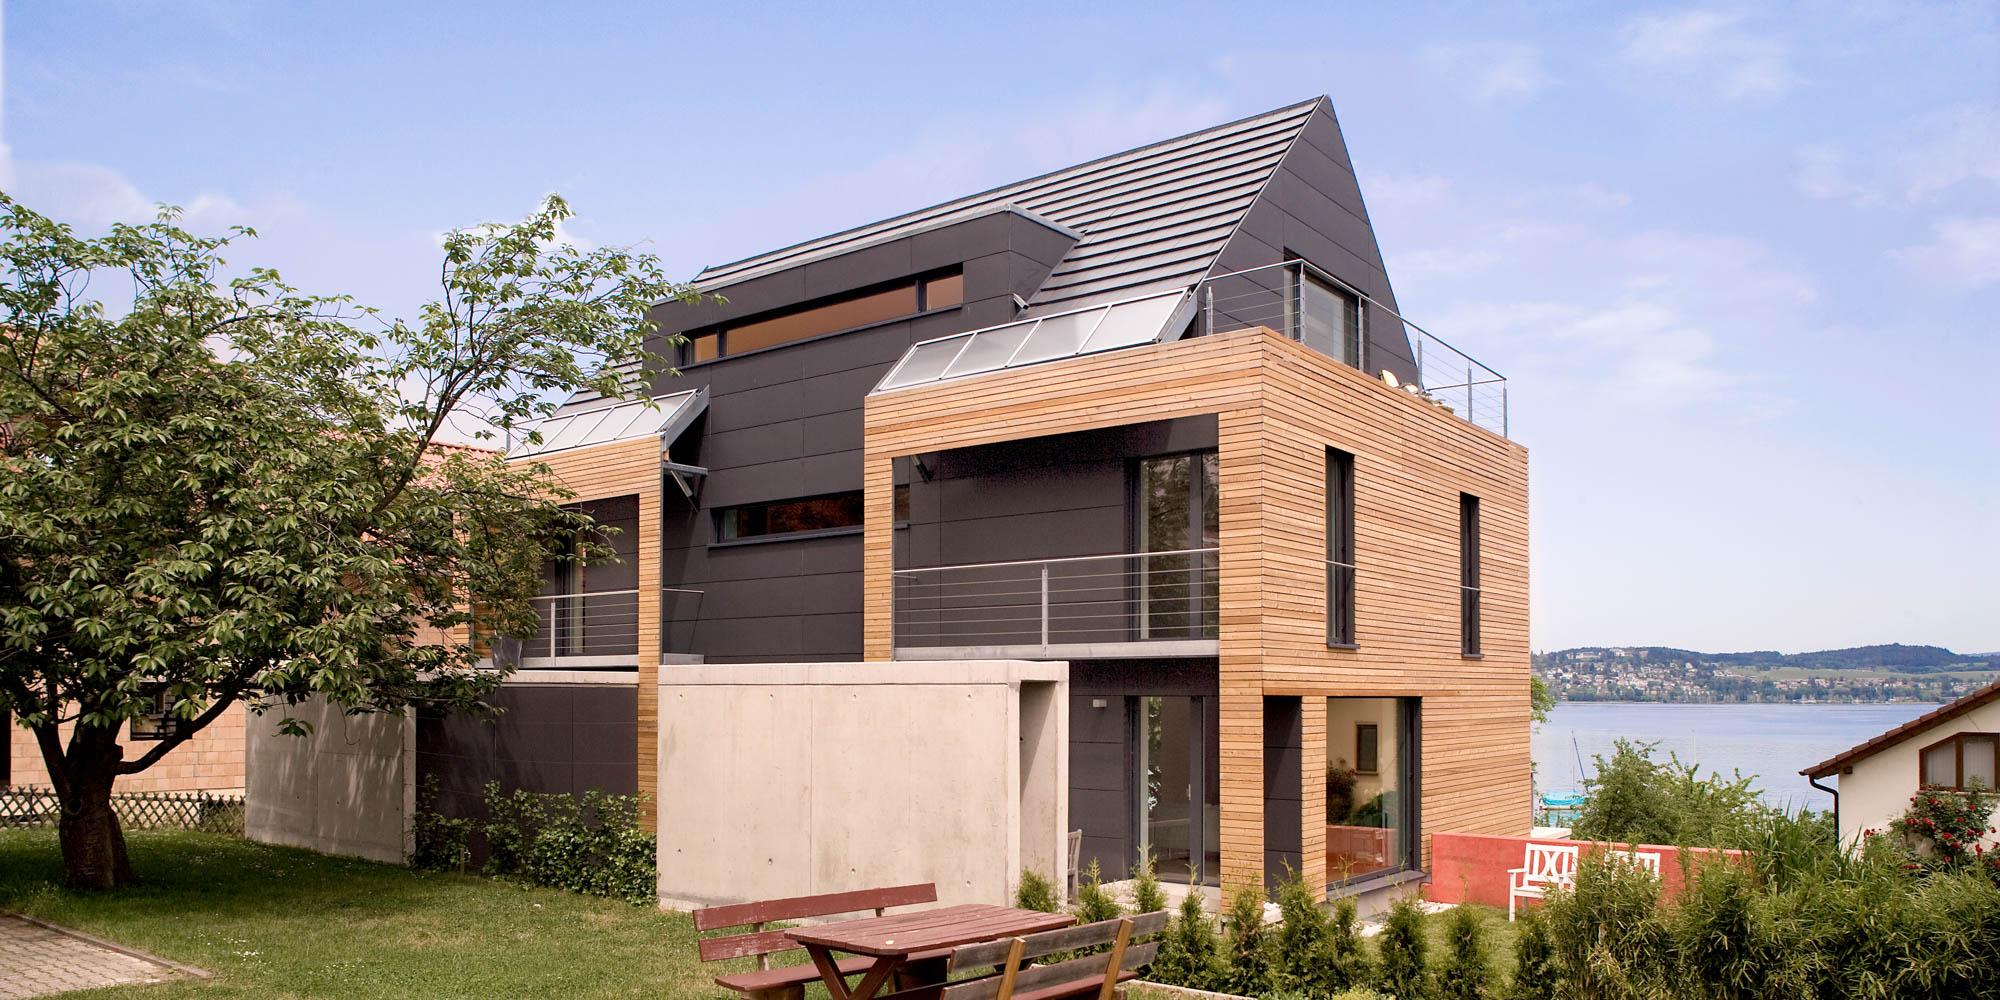 Modernes holzhaus  Passivhaus am Bodensee | Klimaholzhaus | Modernes Holzhaus ...